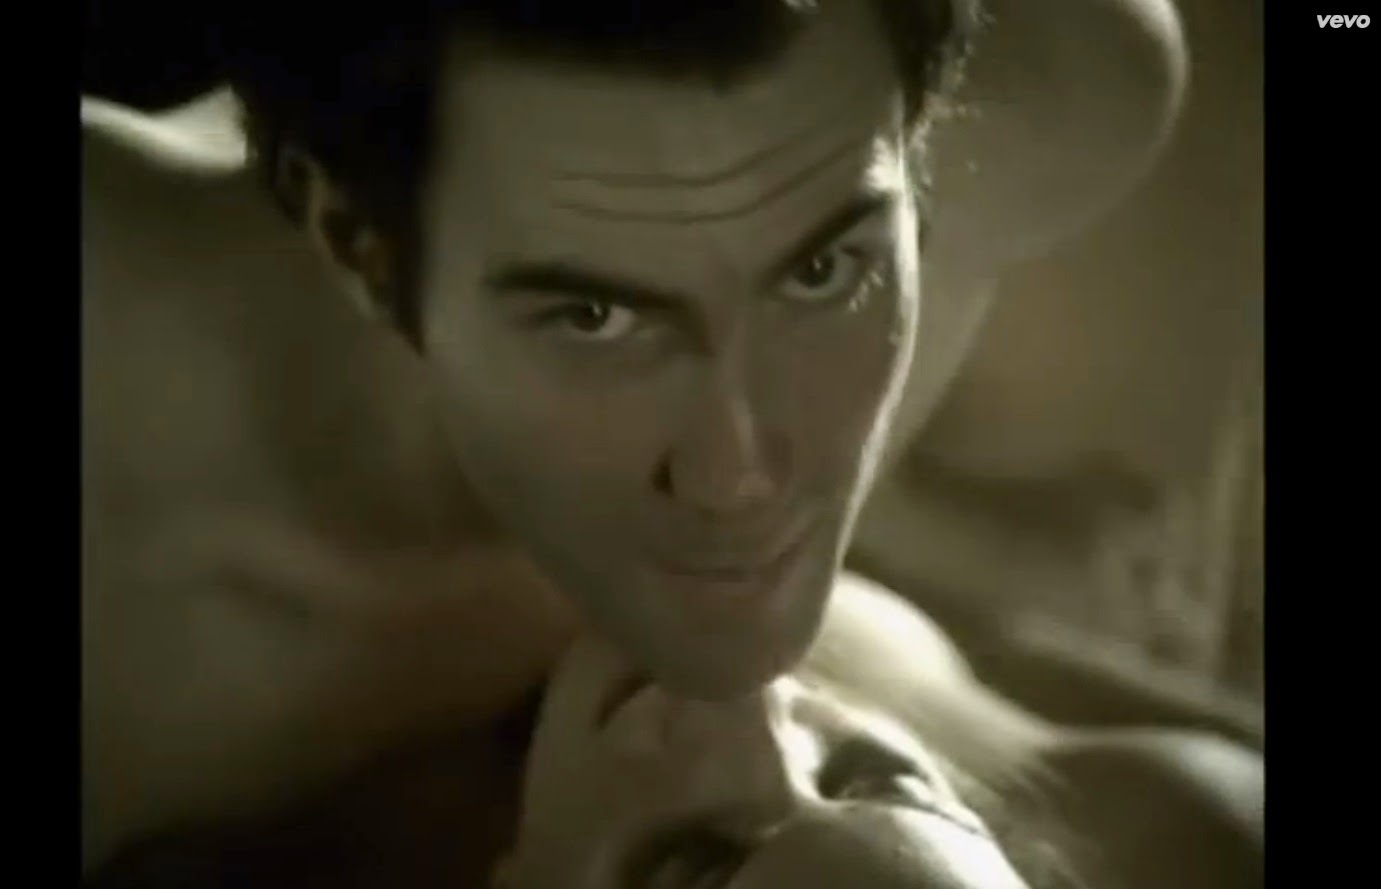 music videos sex Watch Sex music video.